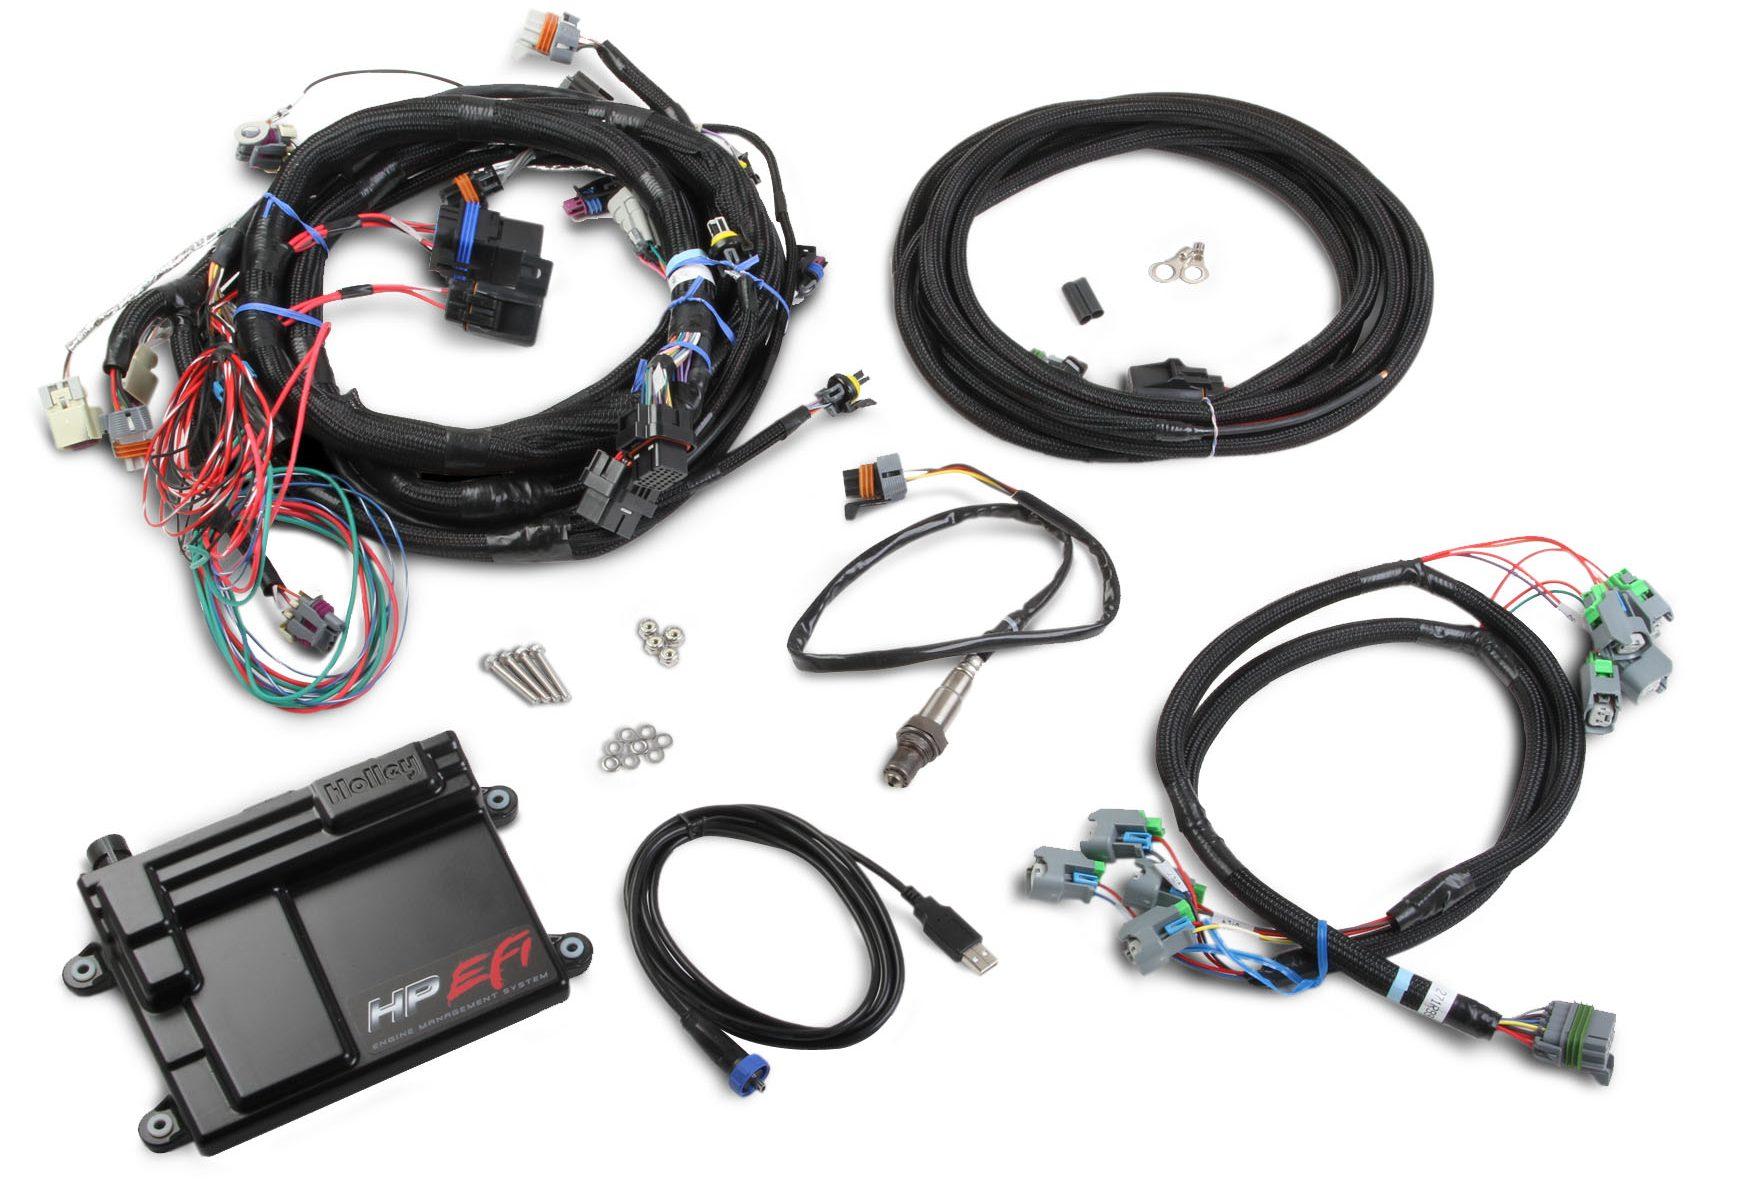 holley gm ls2 ls3 ls7 hp efi ecu \u0026 harness kits 2002 Honda Civic home shop wiring harness holley gm ls2 ls3 ls7 hp efi ecu \u0026 harness kits